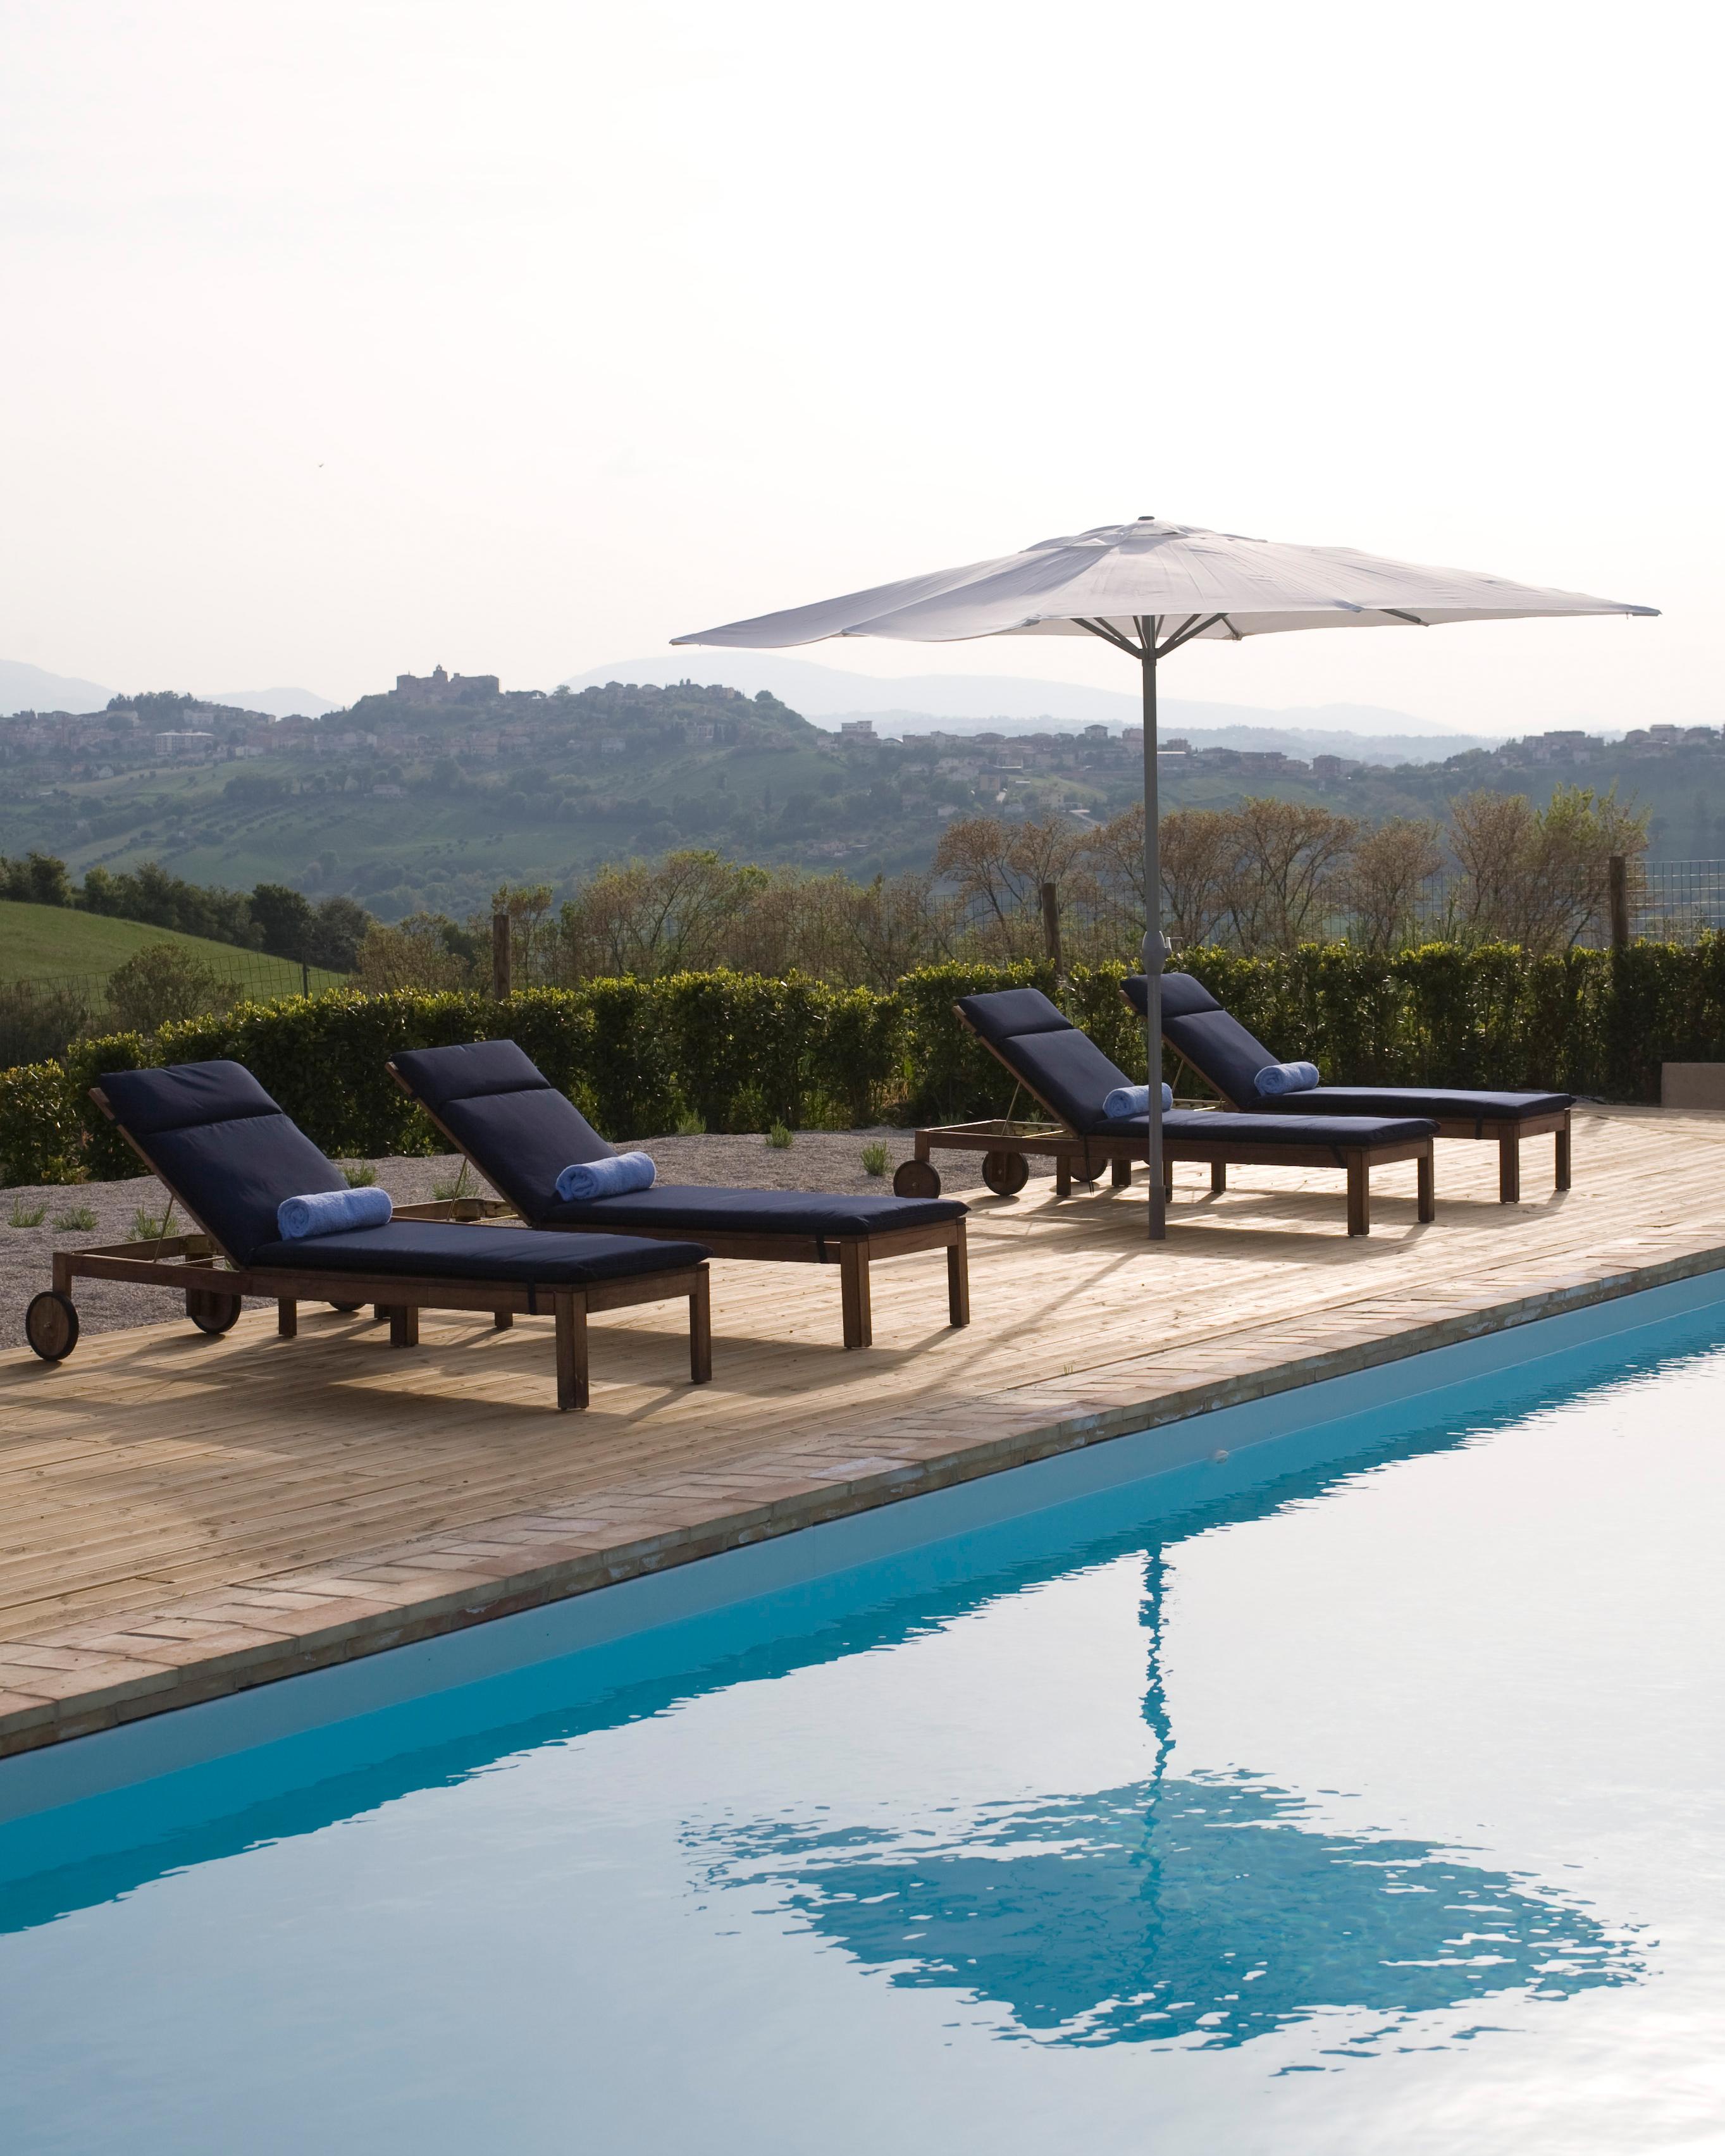 affordable-hotels-italy-06-casa-san-ruffino-0814.jpg